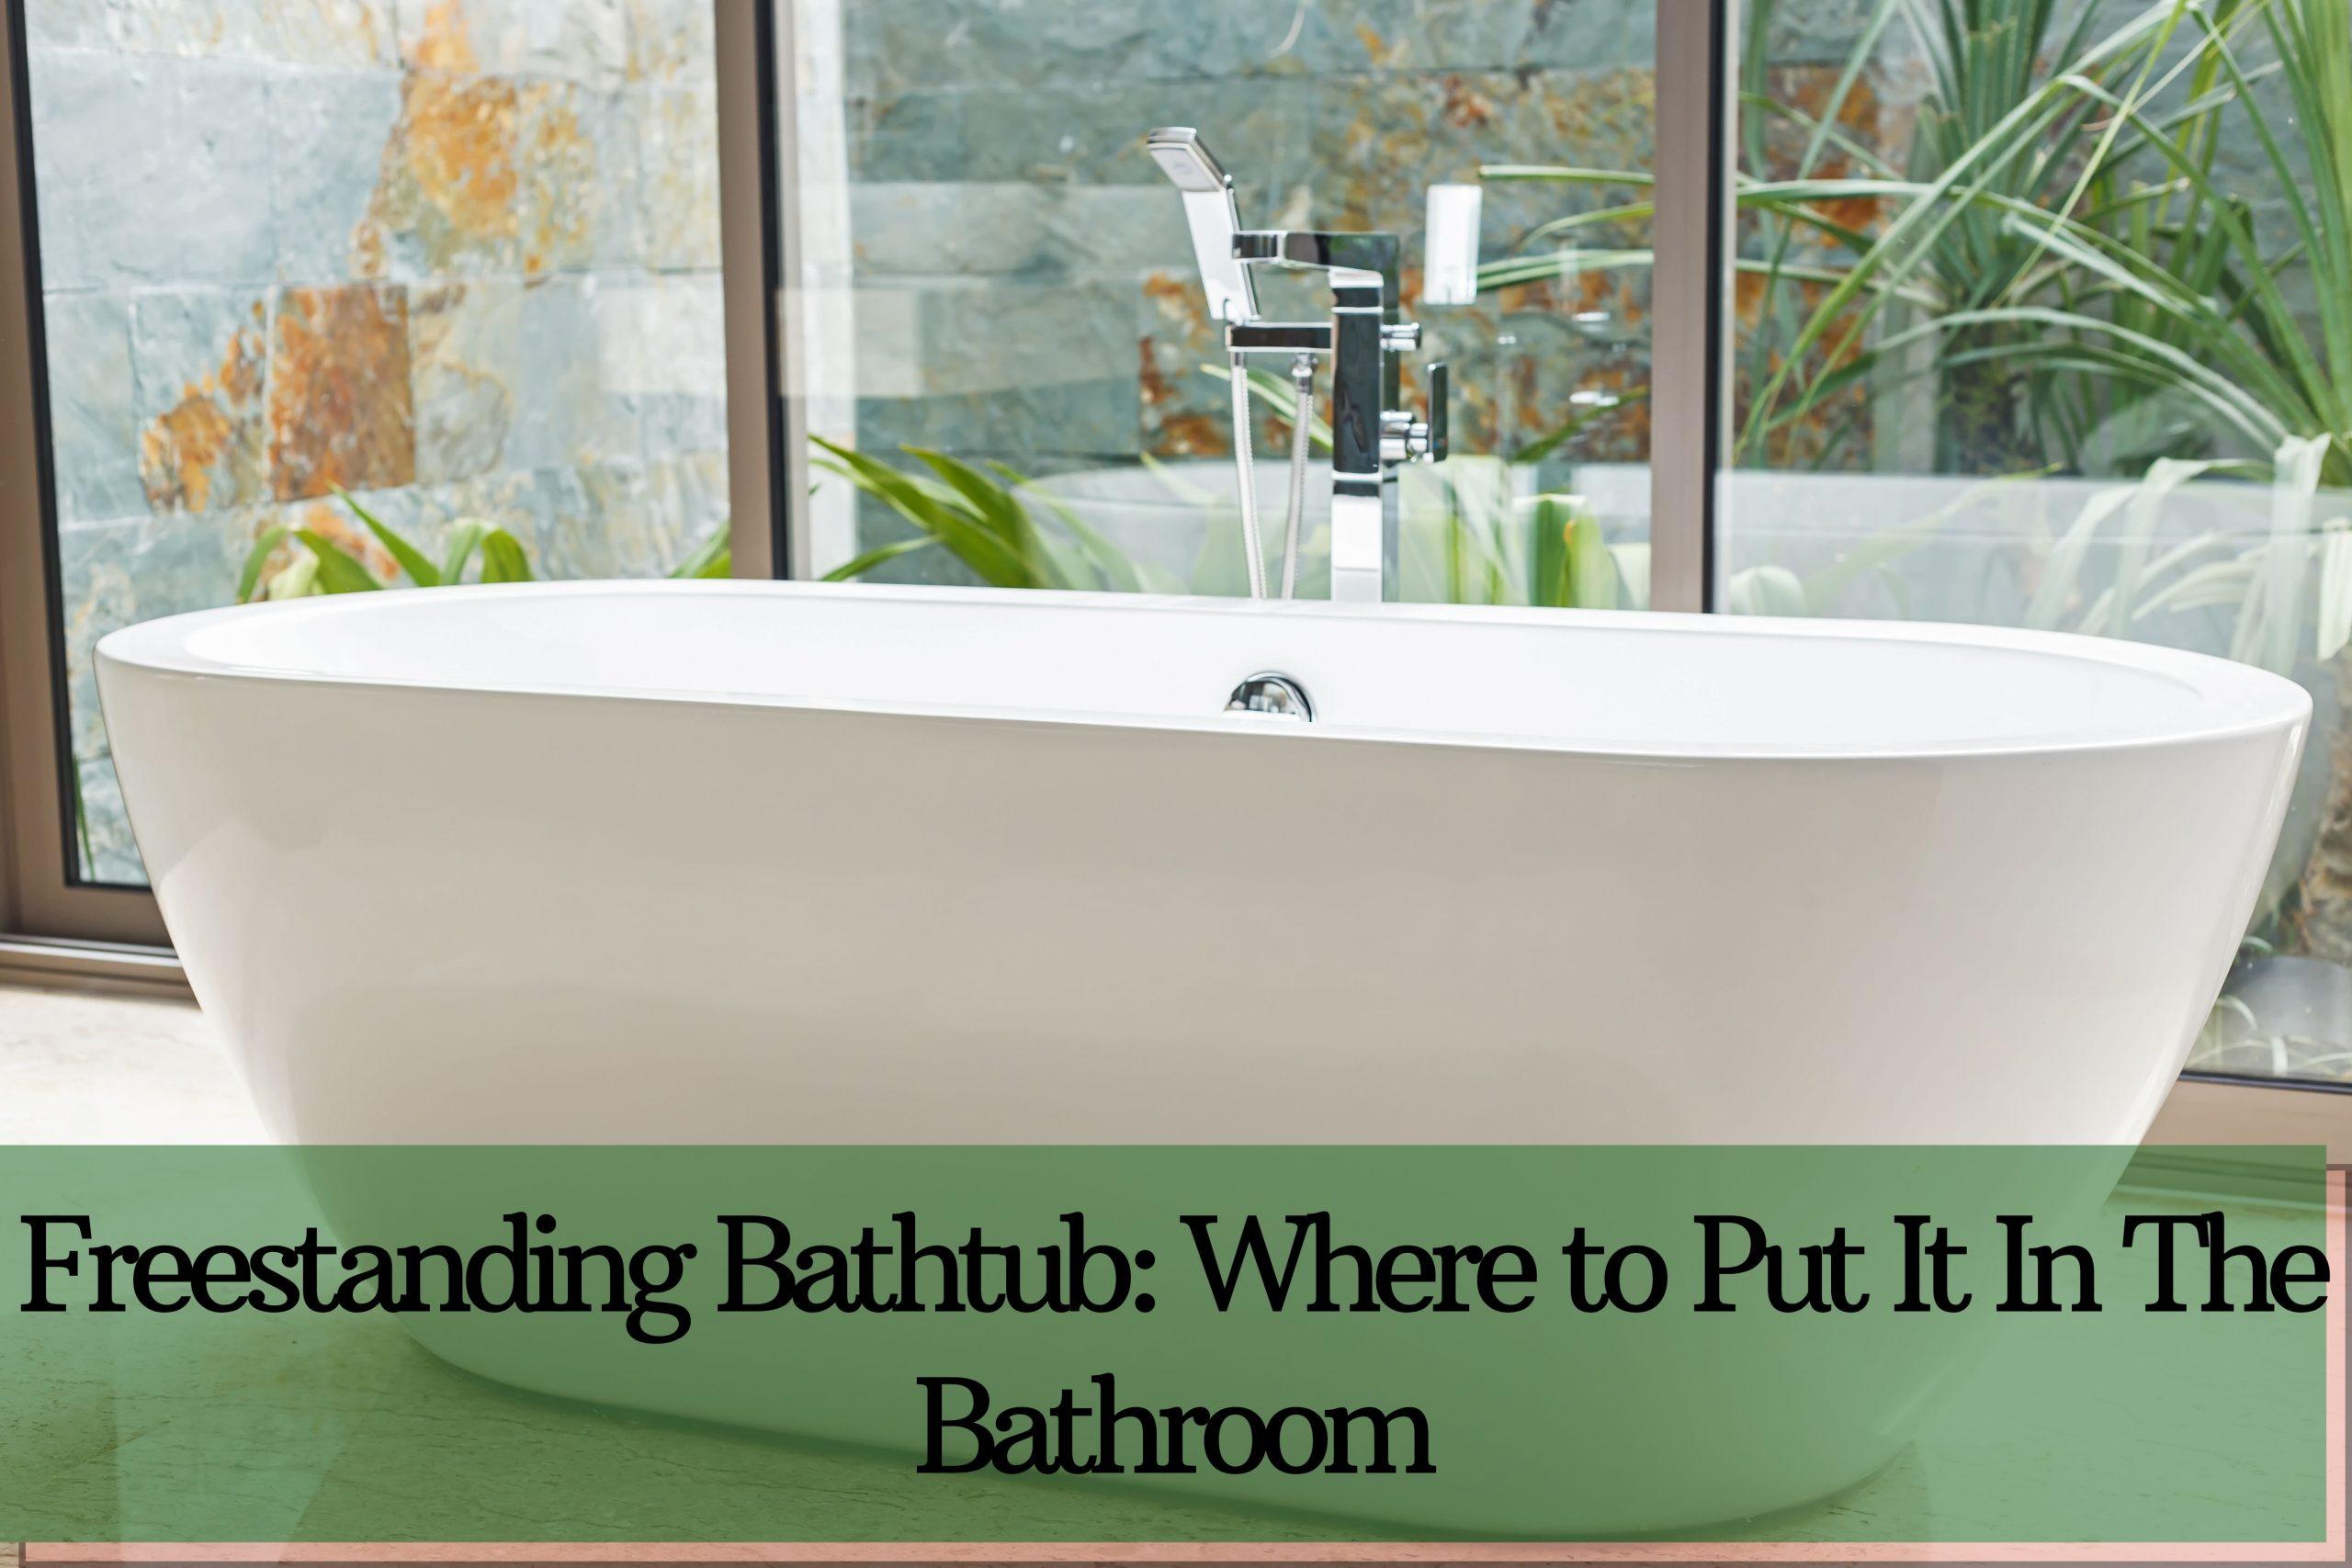 Freestanding Bathtub Where to Put It In The Bathroom